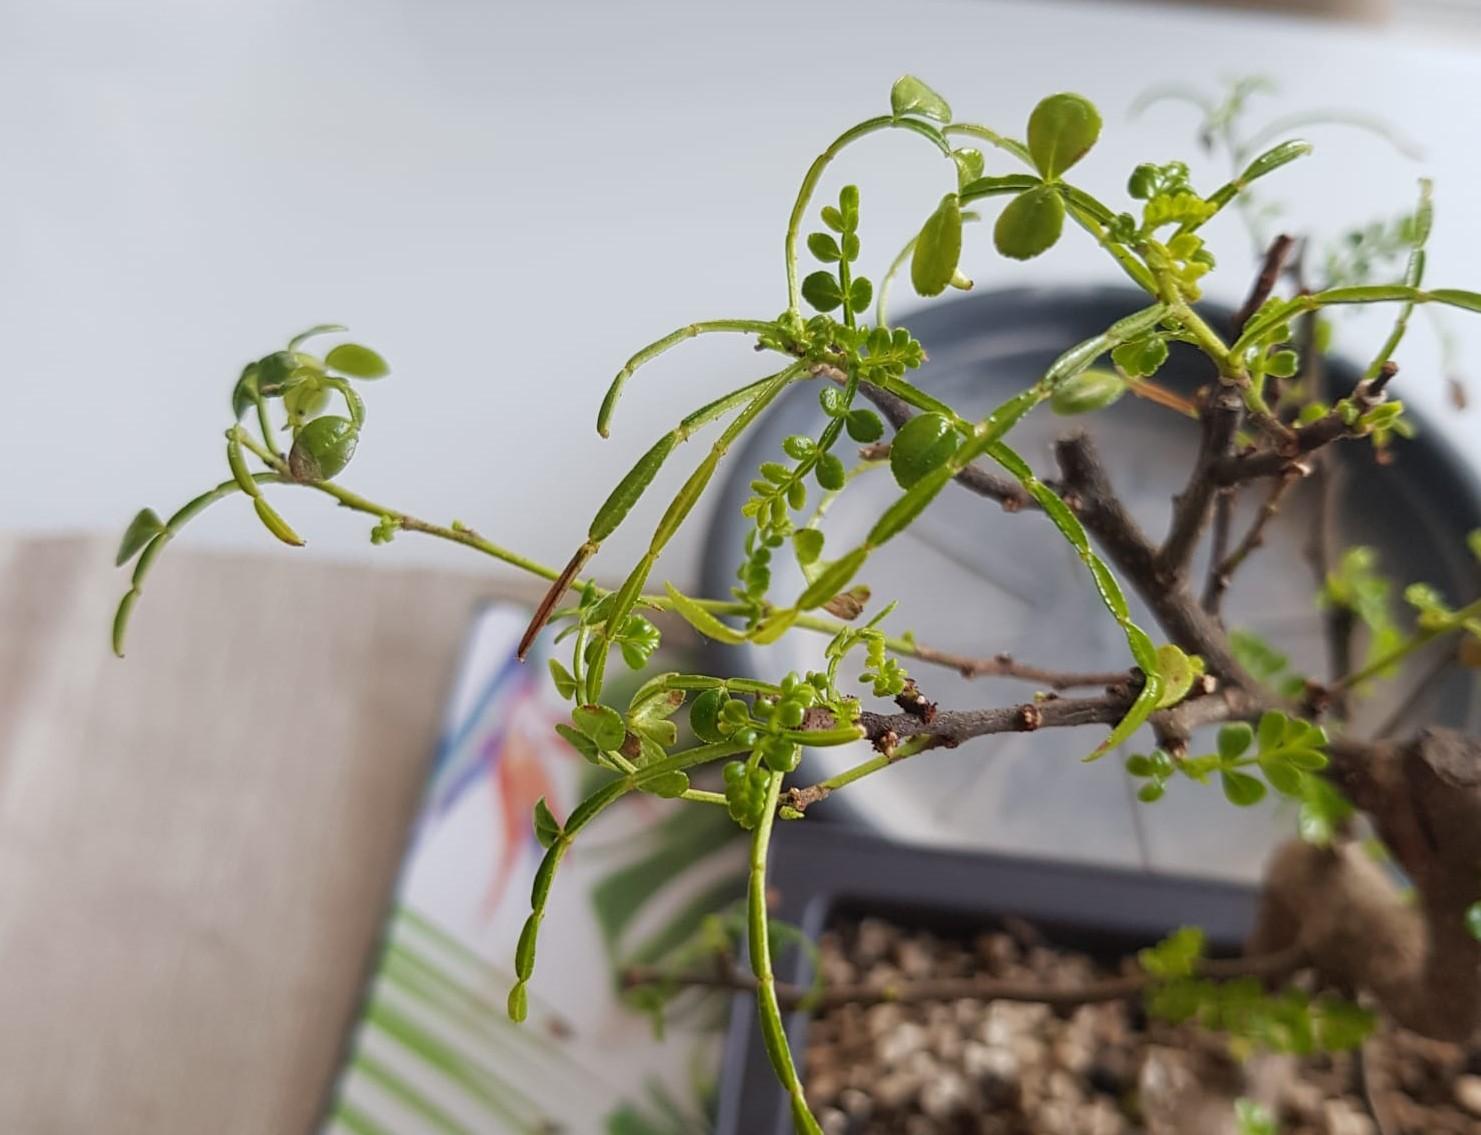 primo bonsai pepper tree: chiedo consigli - Pagina 2 Bonsai1